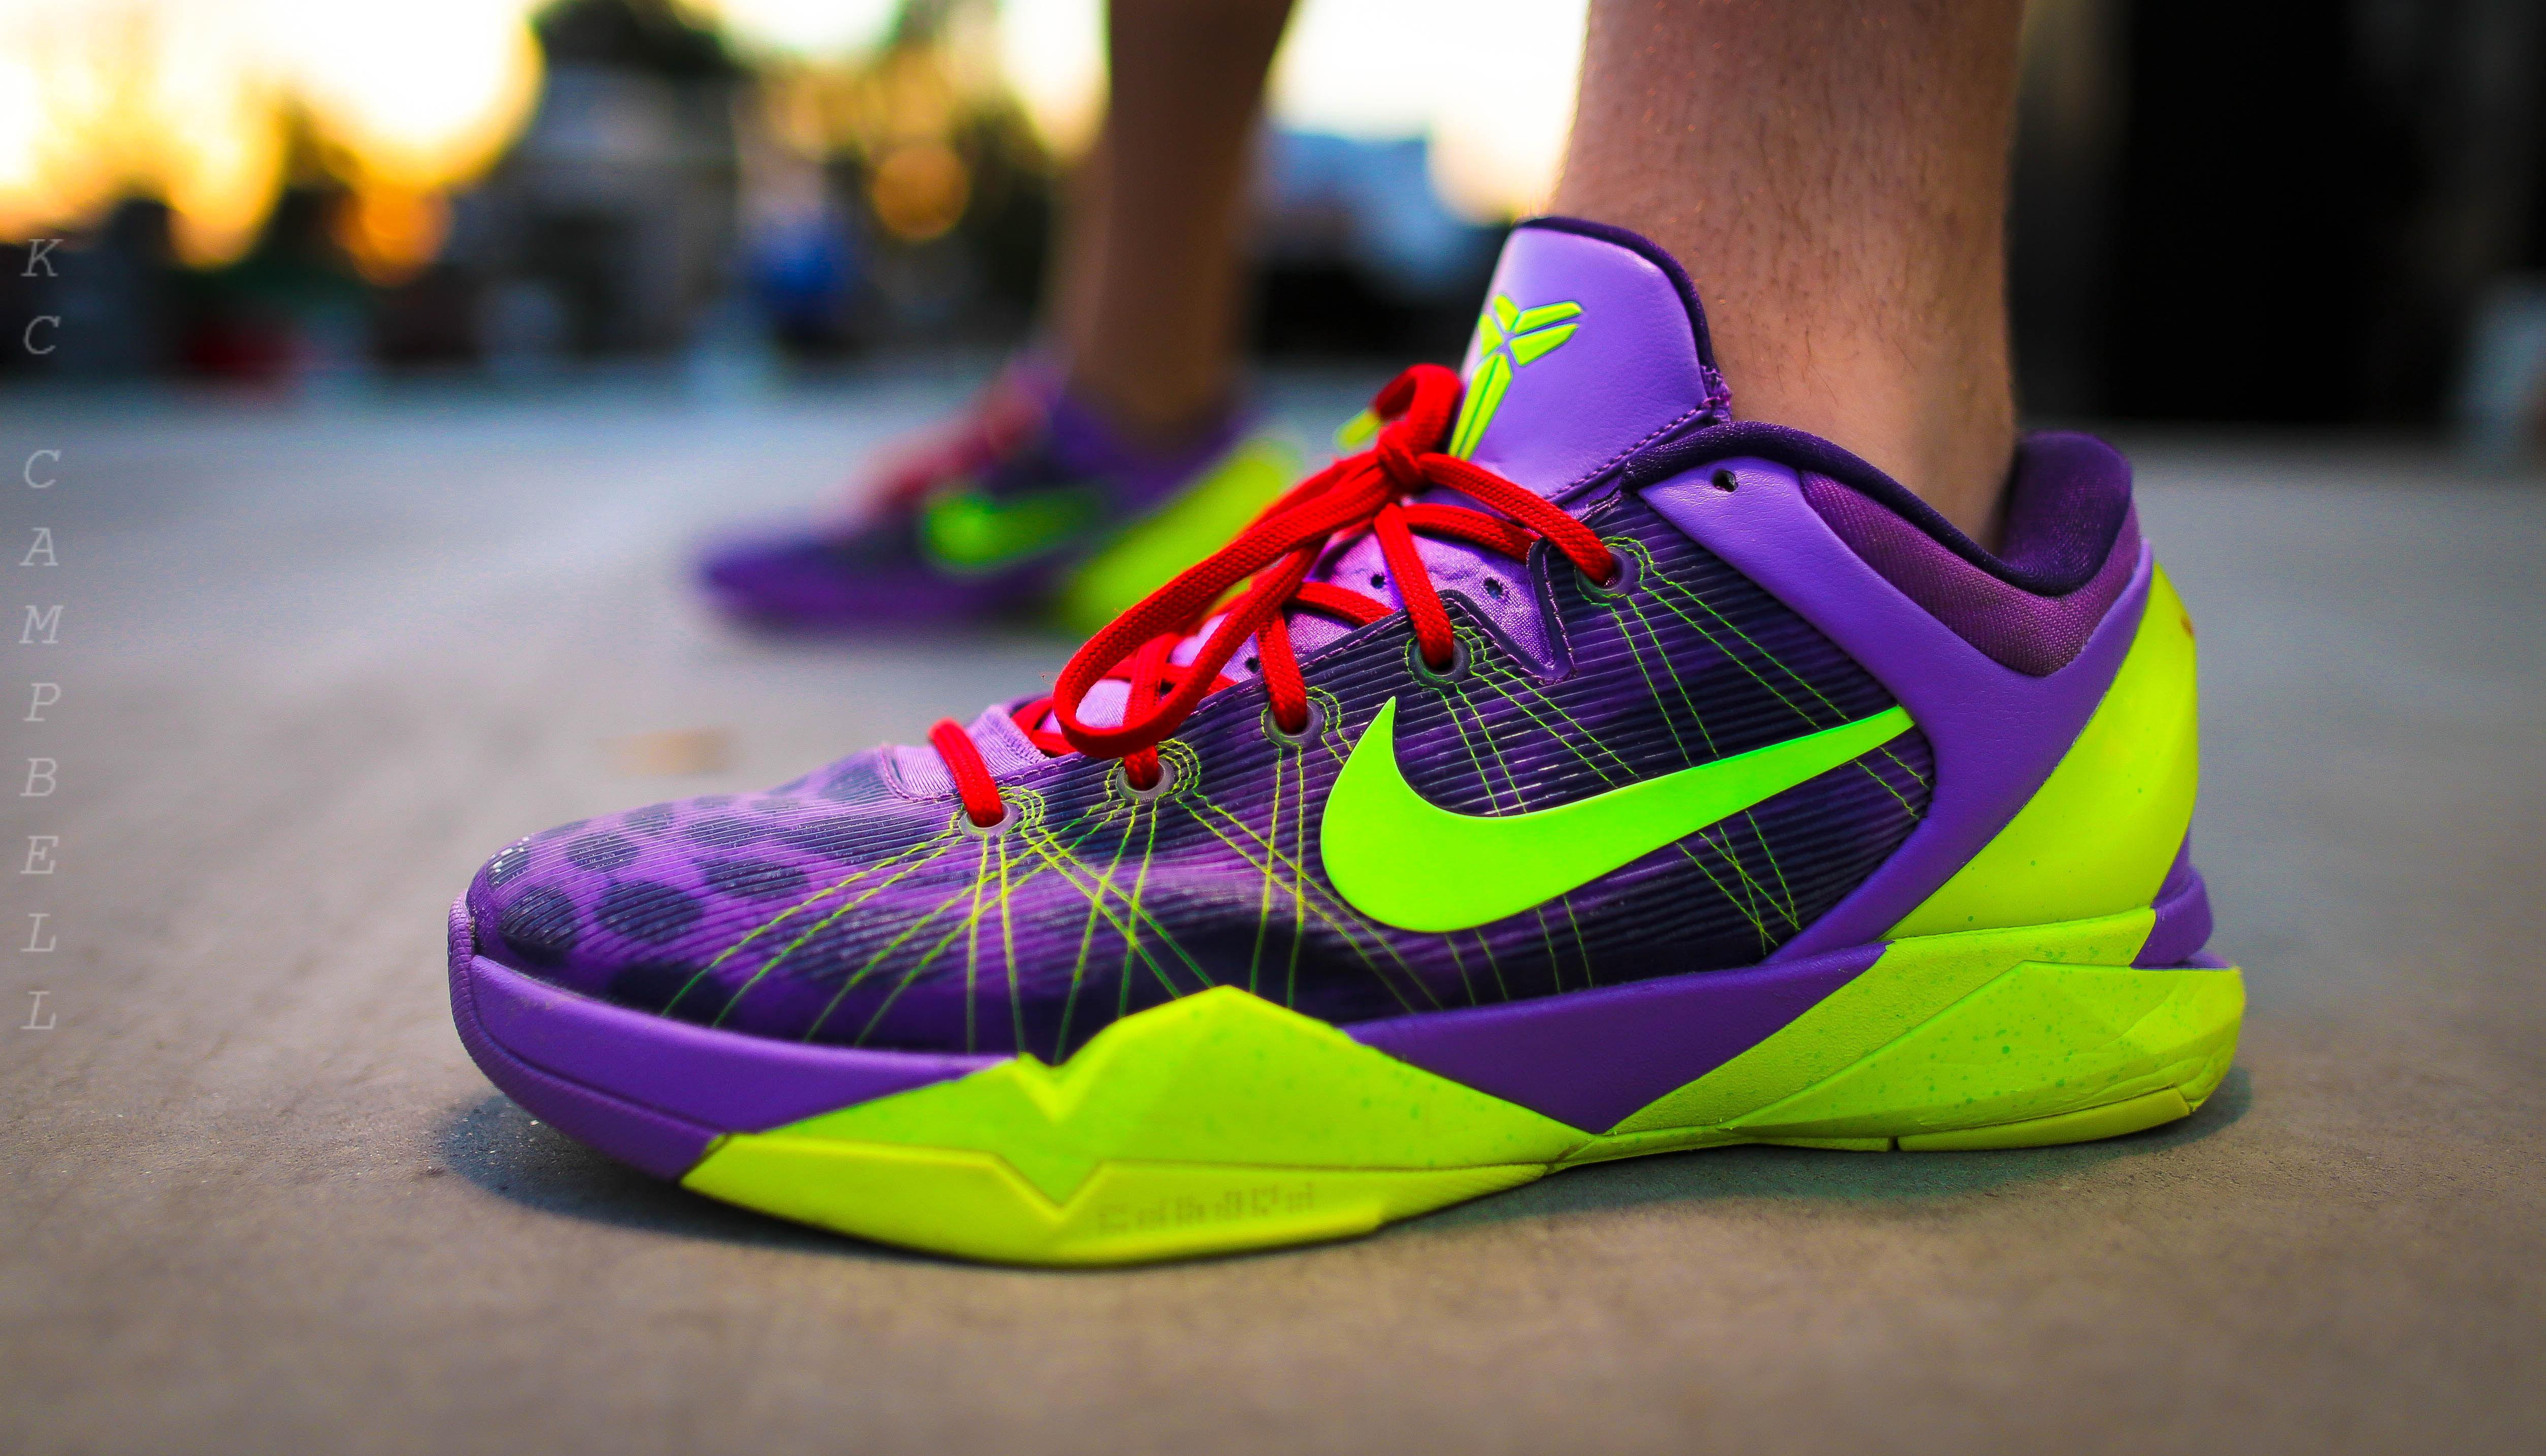 4718f1488632 ... Kobe 7 Christmas Shoes Nike Kobe 7 Christmas ...